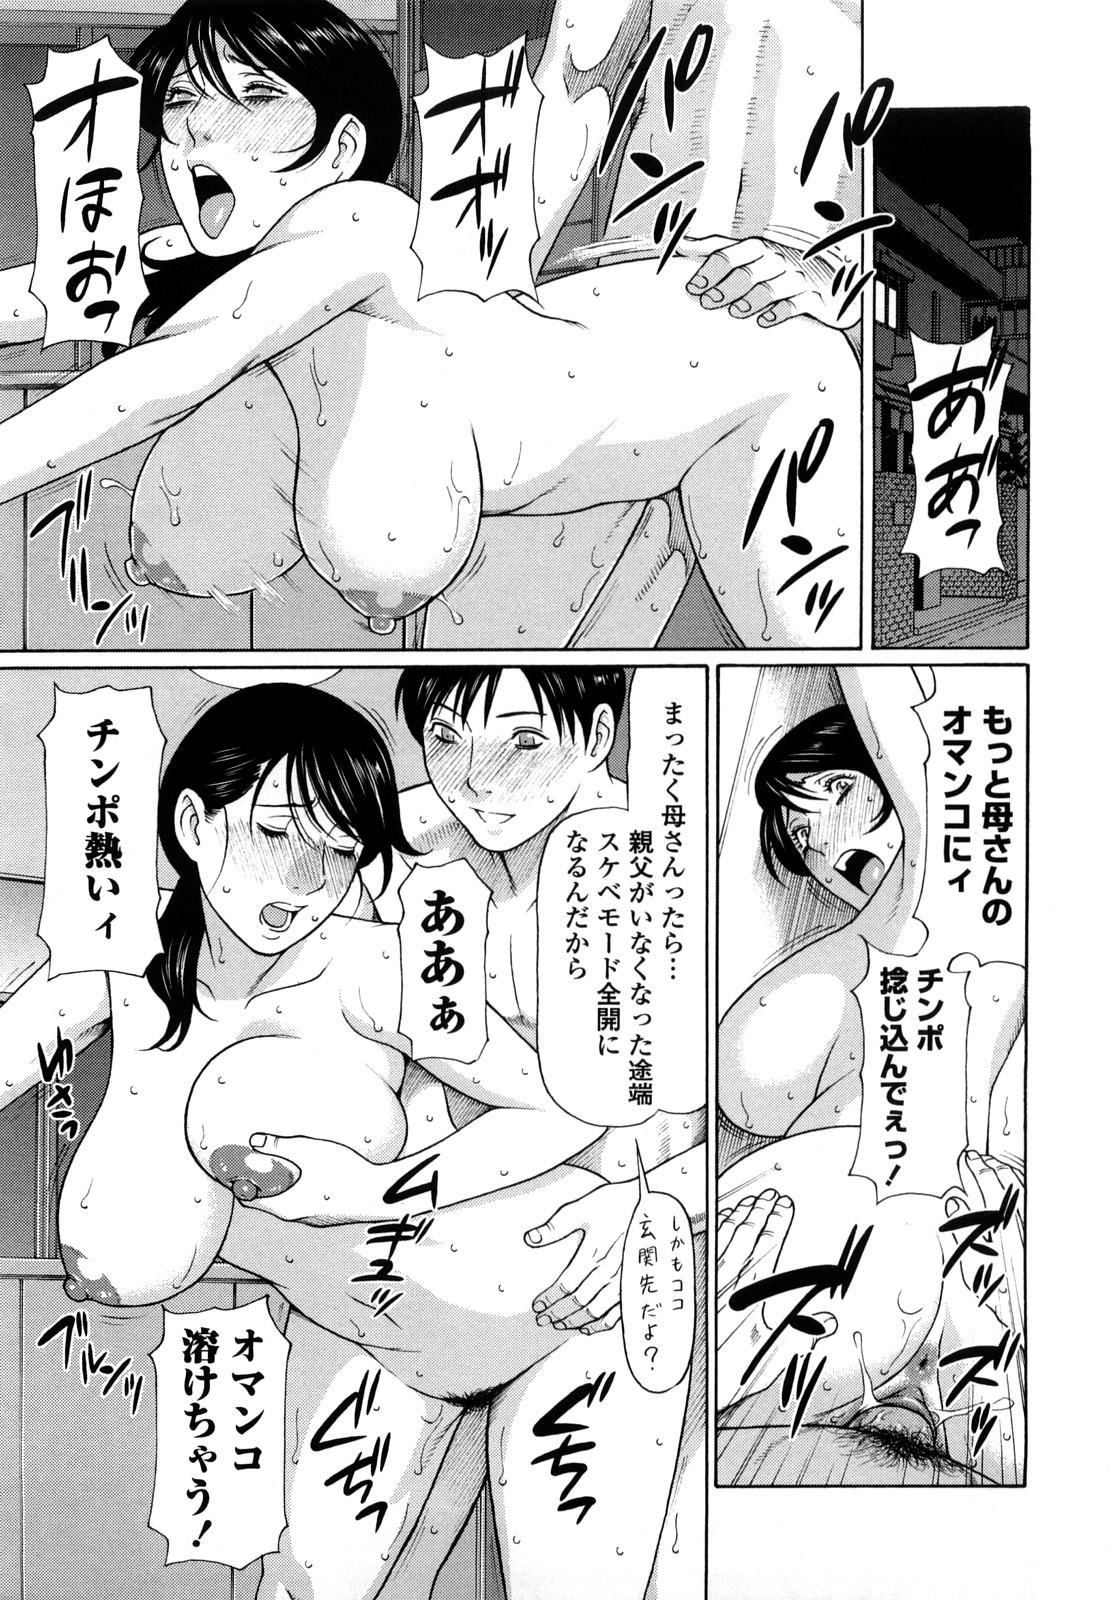 [Takasugi Kou] Kindan no Haha-Ana - Immorality Love-Hole [Decensored] 80